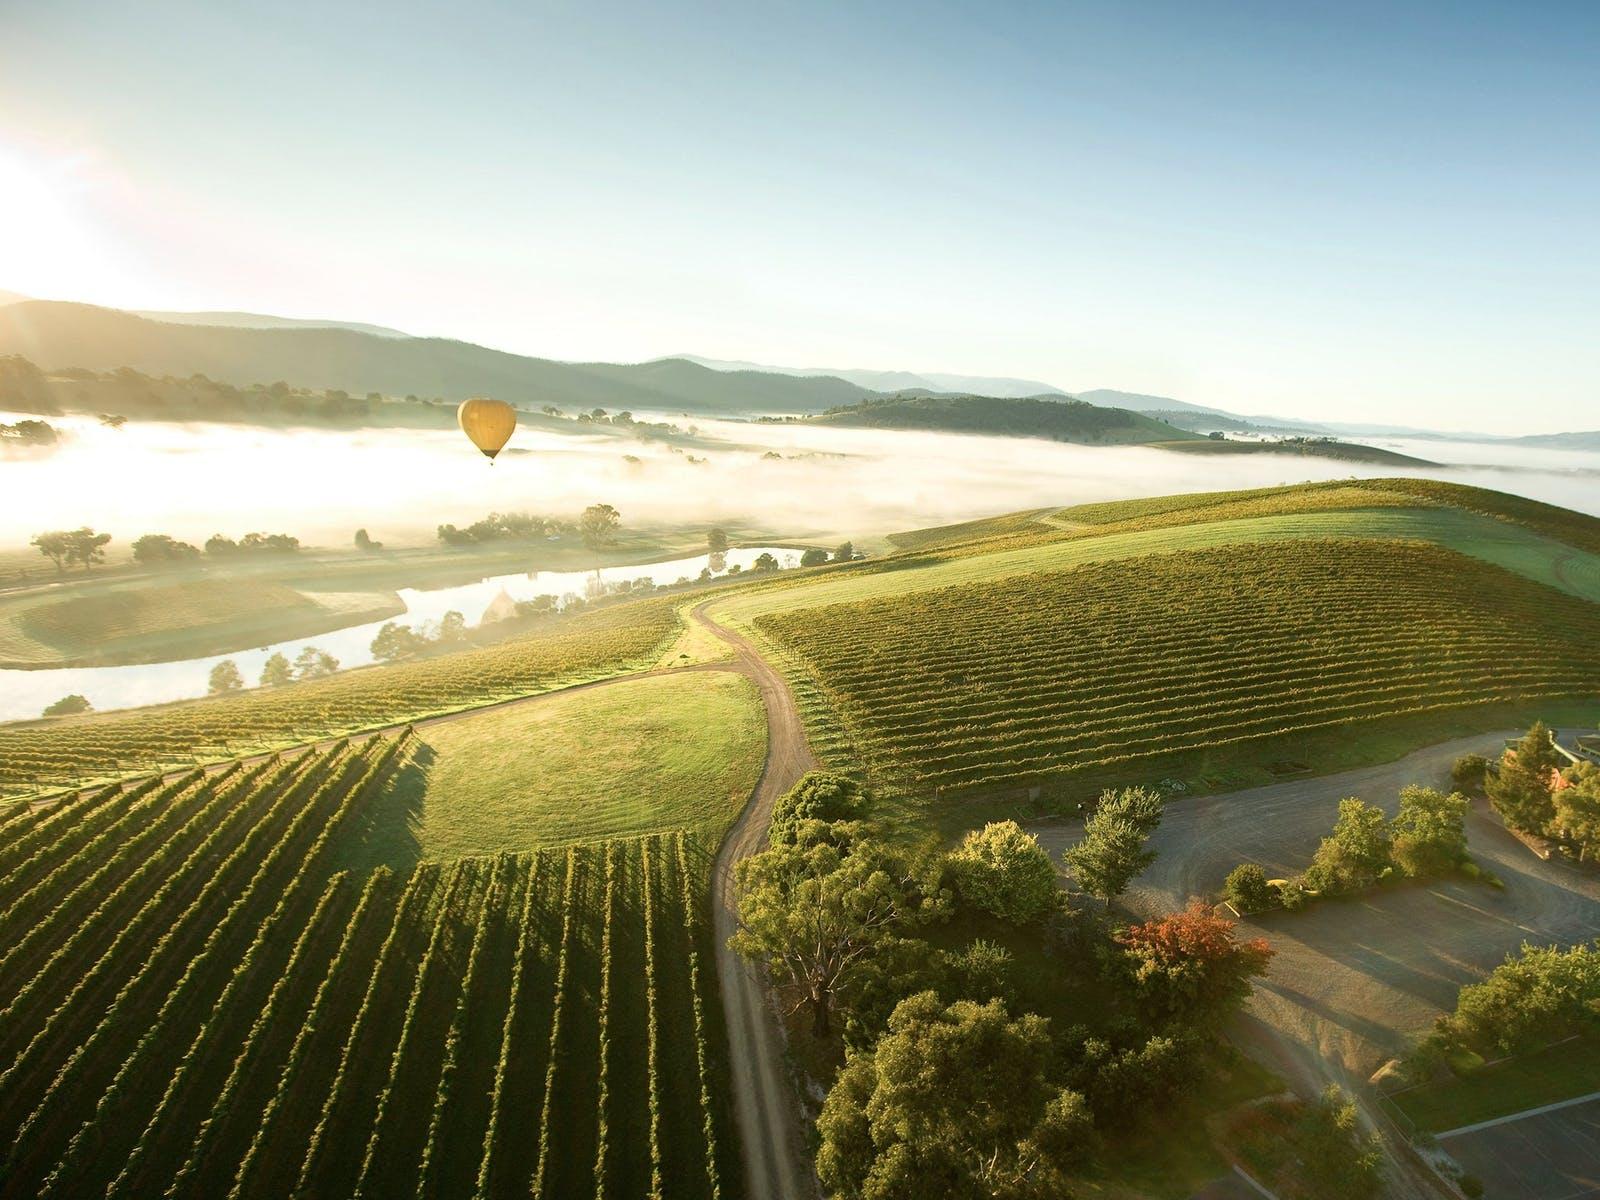 Hot Balloon over Yarra Valley Region